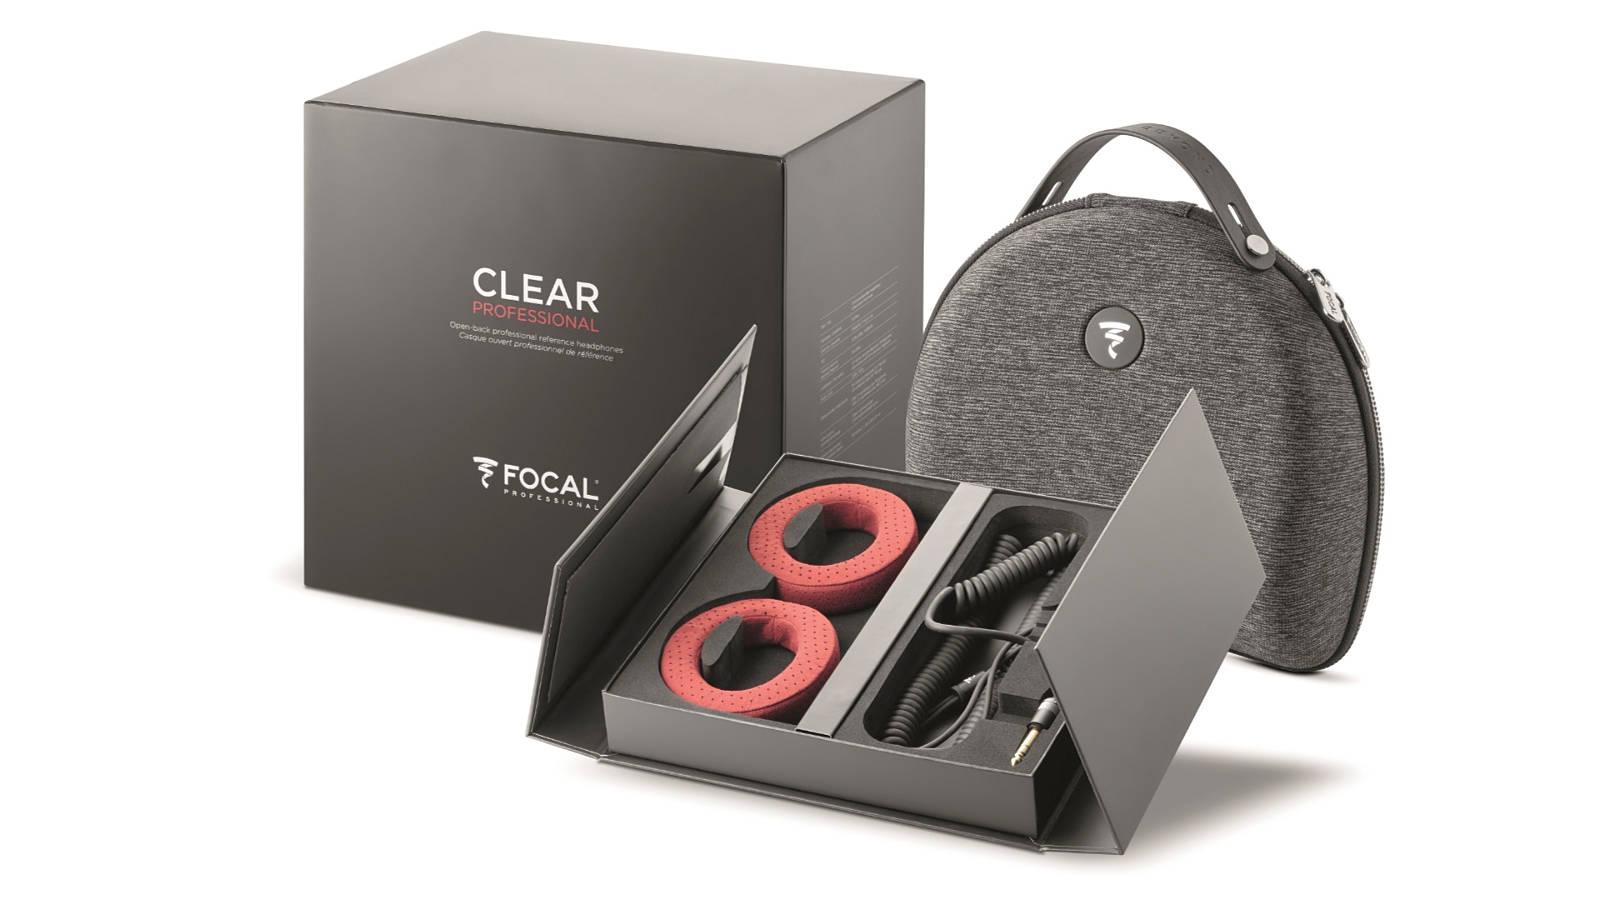 Focal Clear Professional Studiokopfhörer